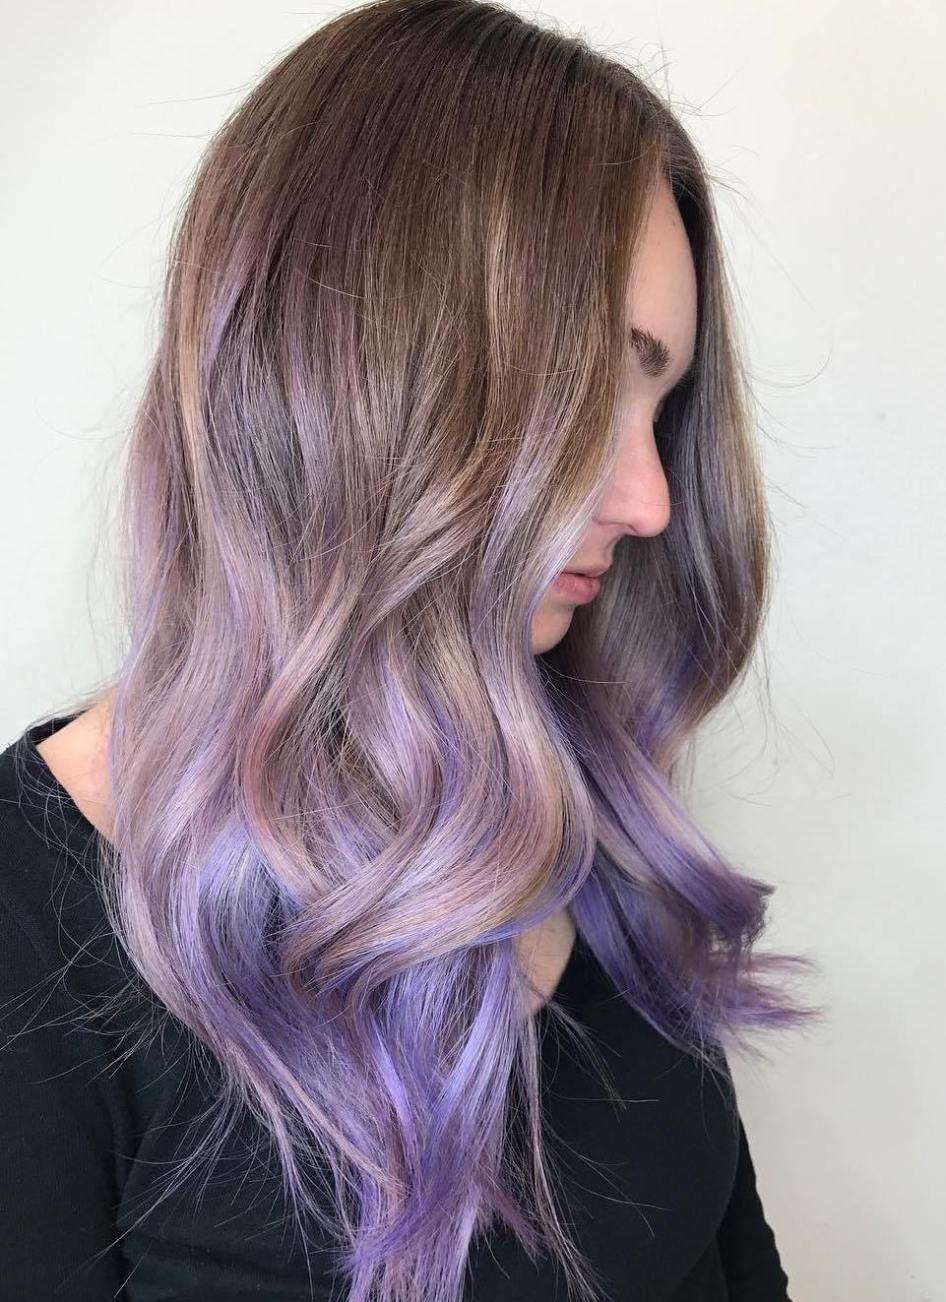 The Prettiest Pastel Purple Hair Ideas | Идеи для волос ...